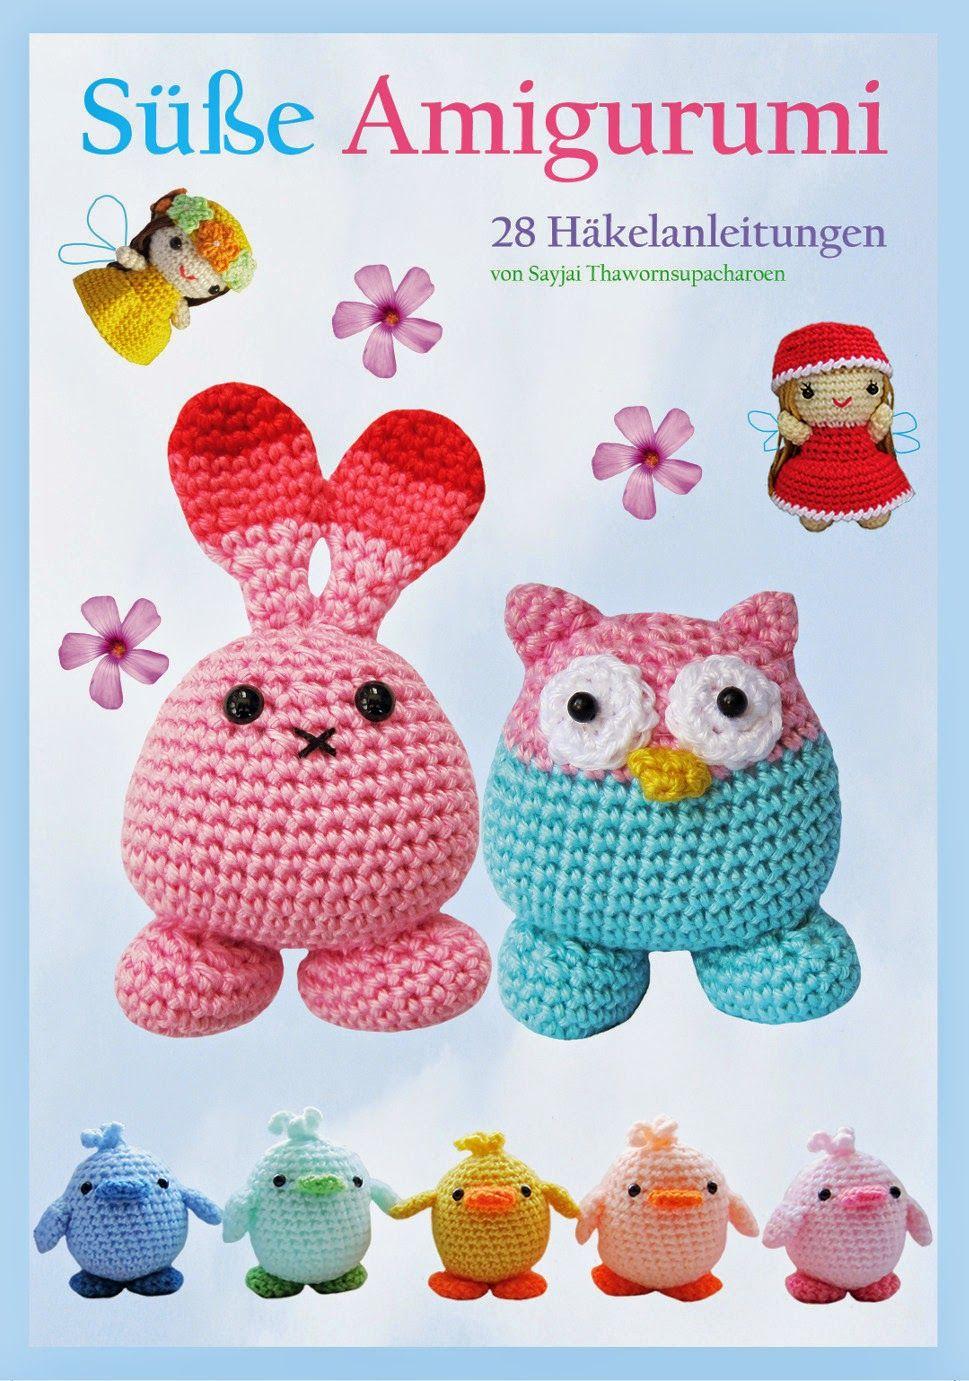 Amigurumi crochet patterns ~ K and J Dolls / K and J Publishing ...